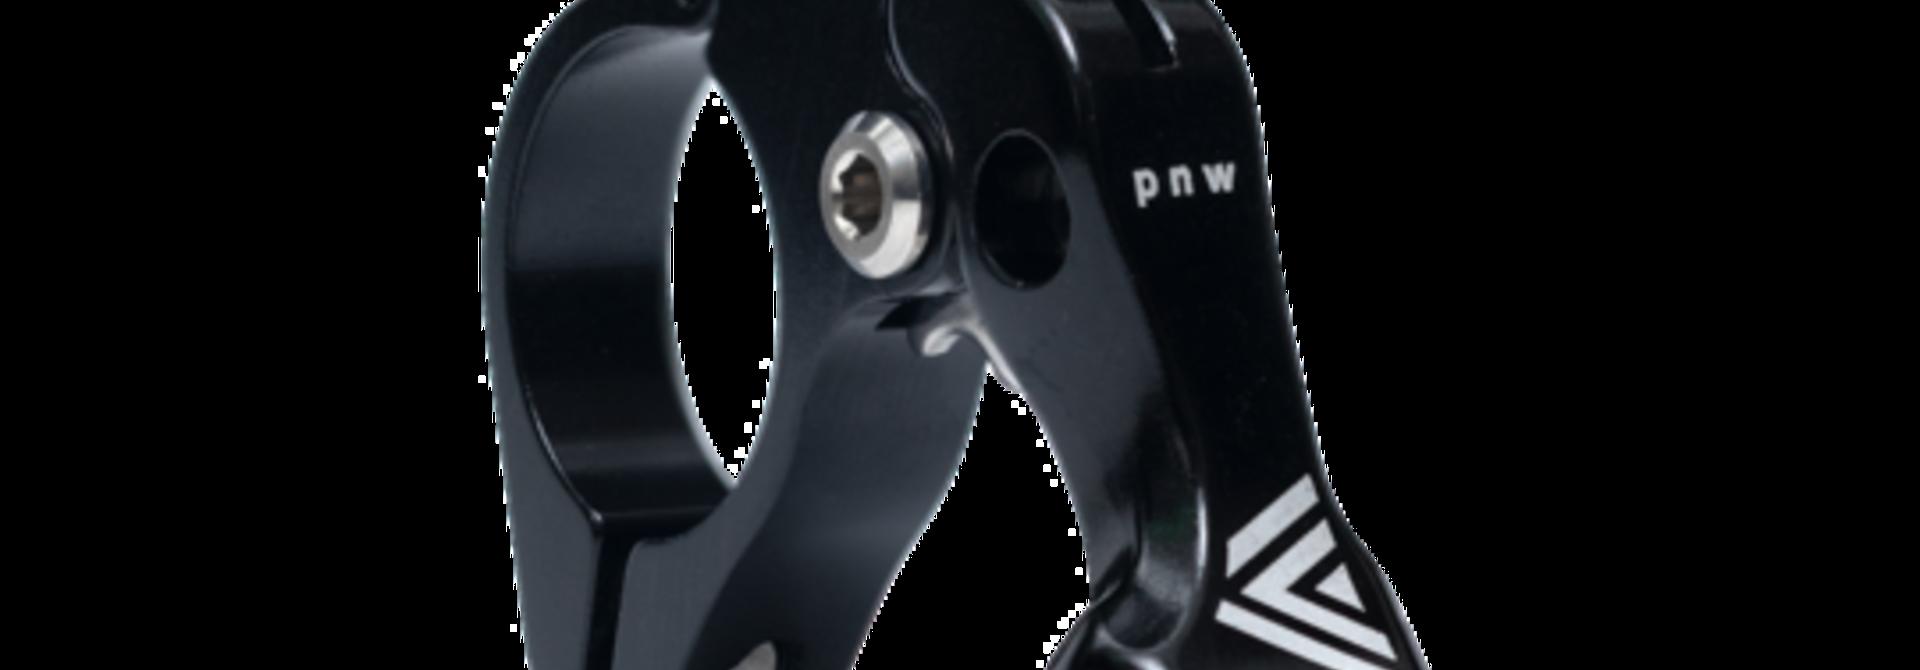 PNW Puget 2X Lever Kit